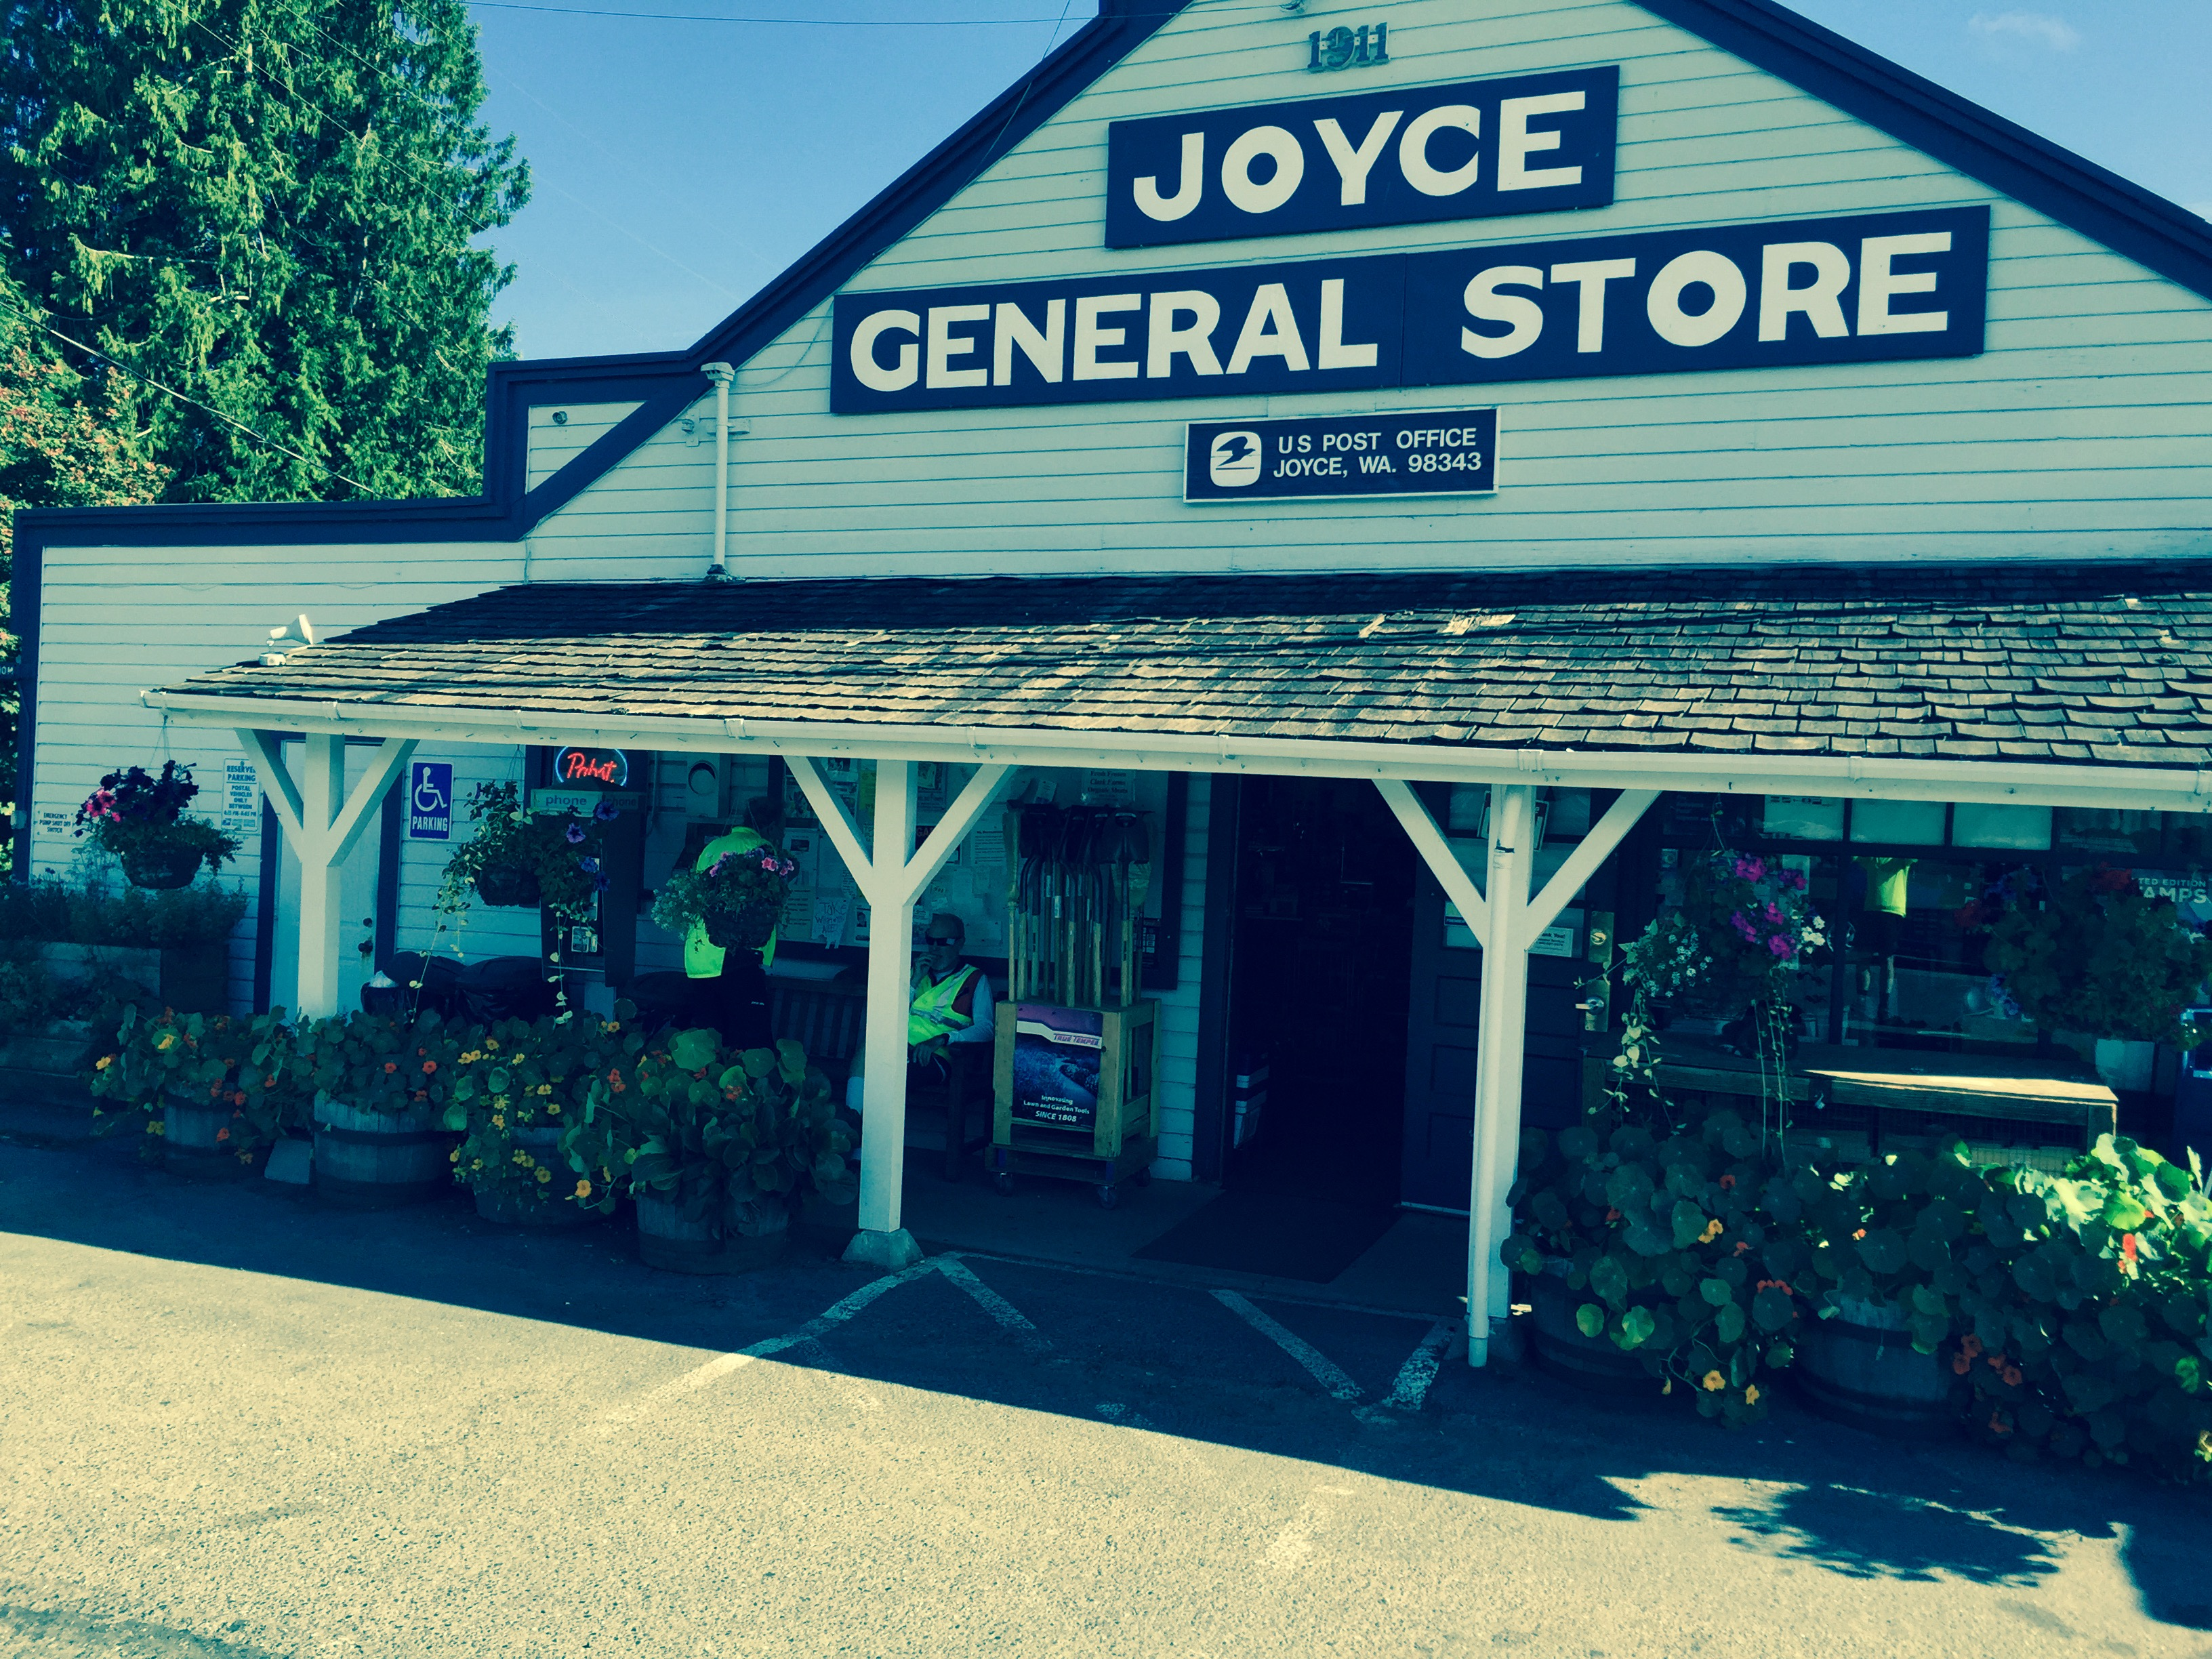 Joyce General Store